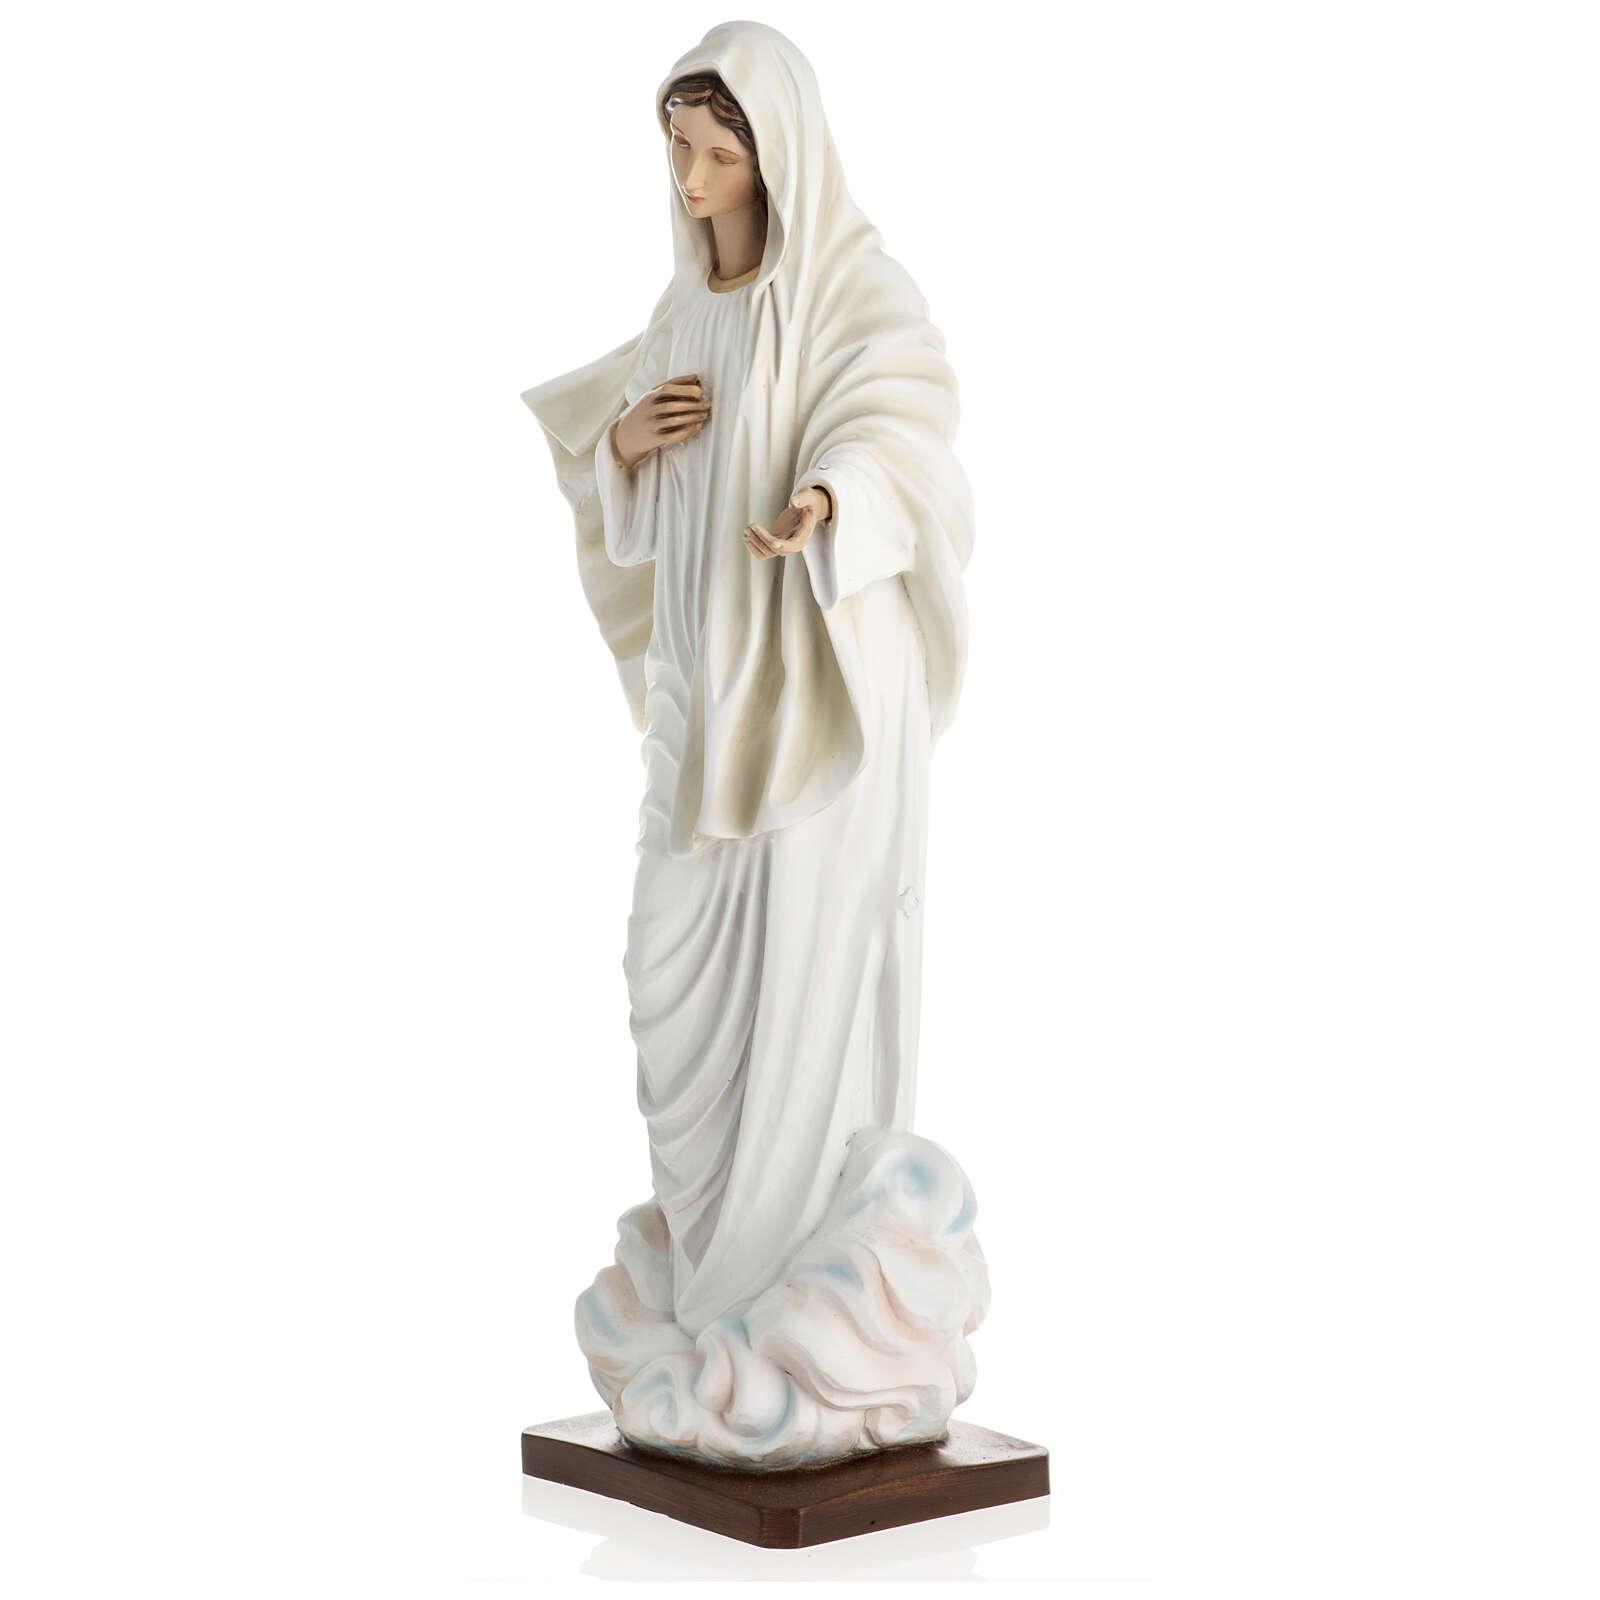 Nuestra Señora de Medjugorje estatua fibra de vidrio 60 cm. 4